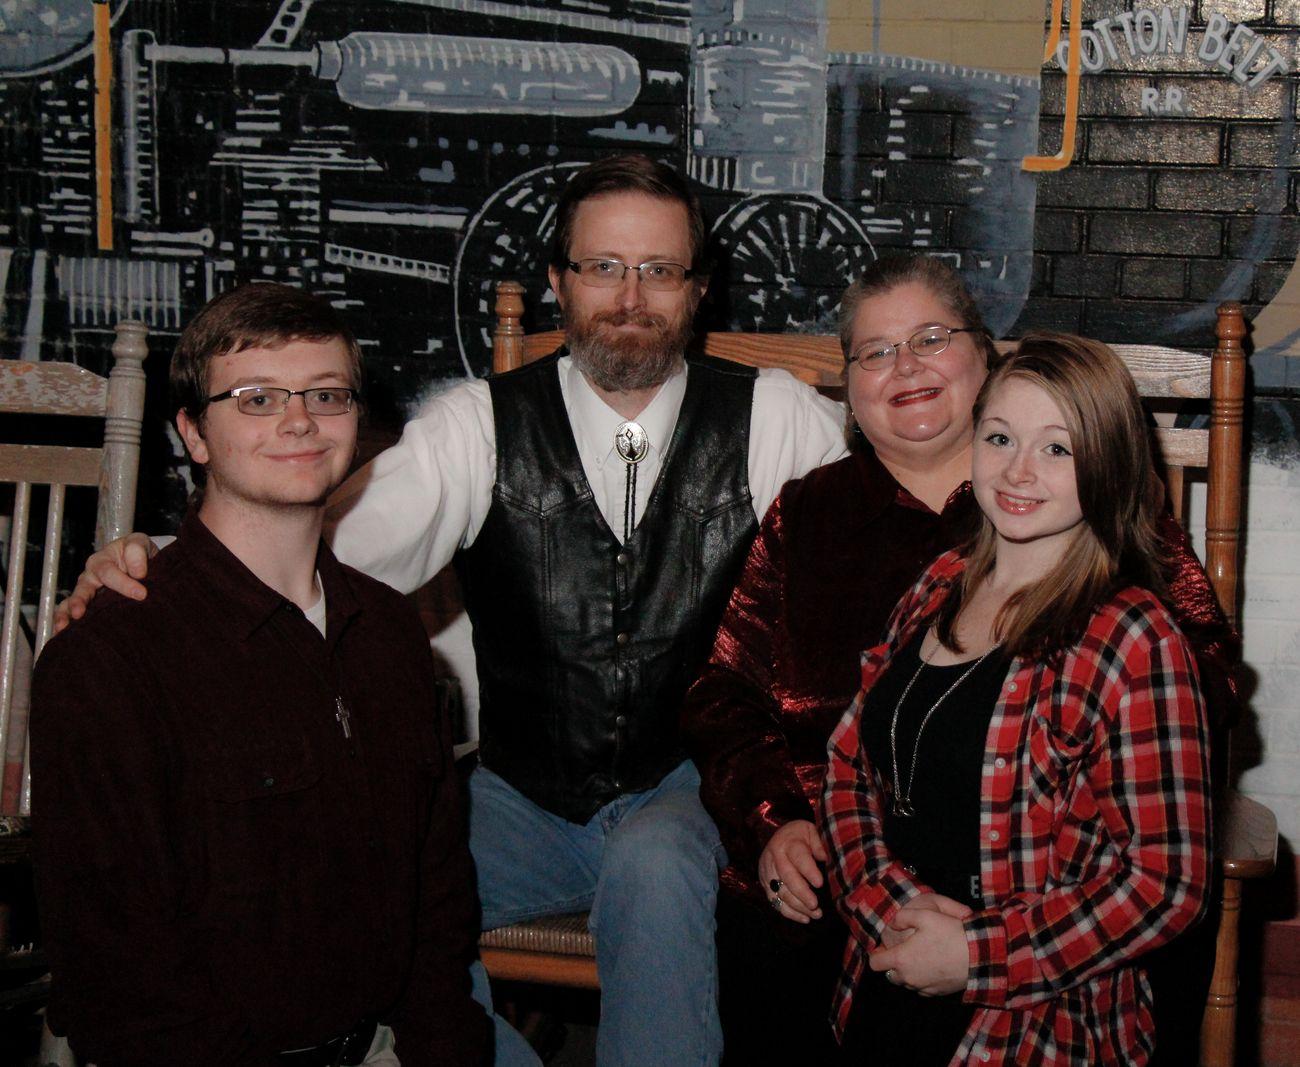 Joe, Pam & Family